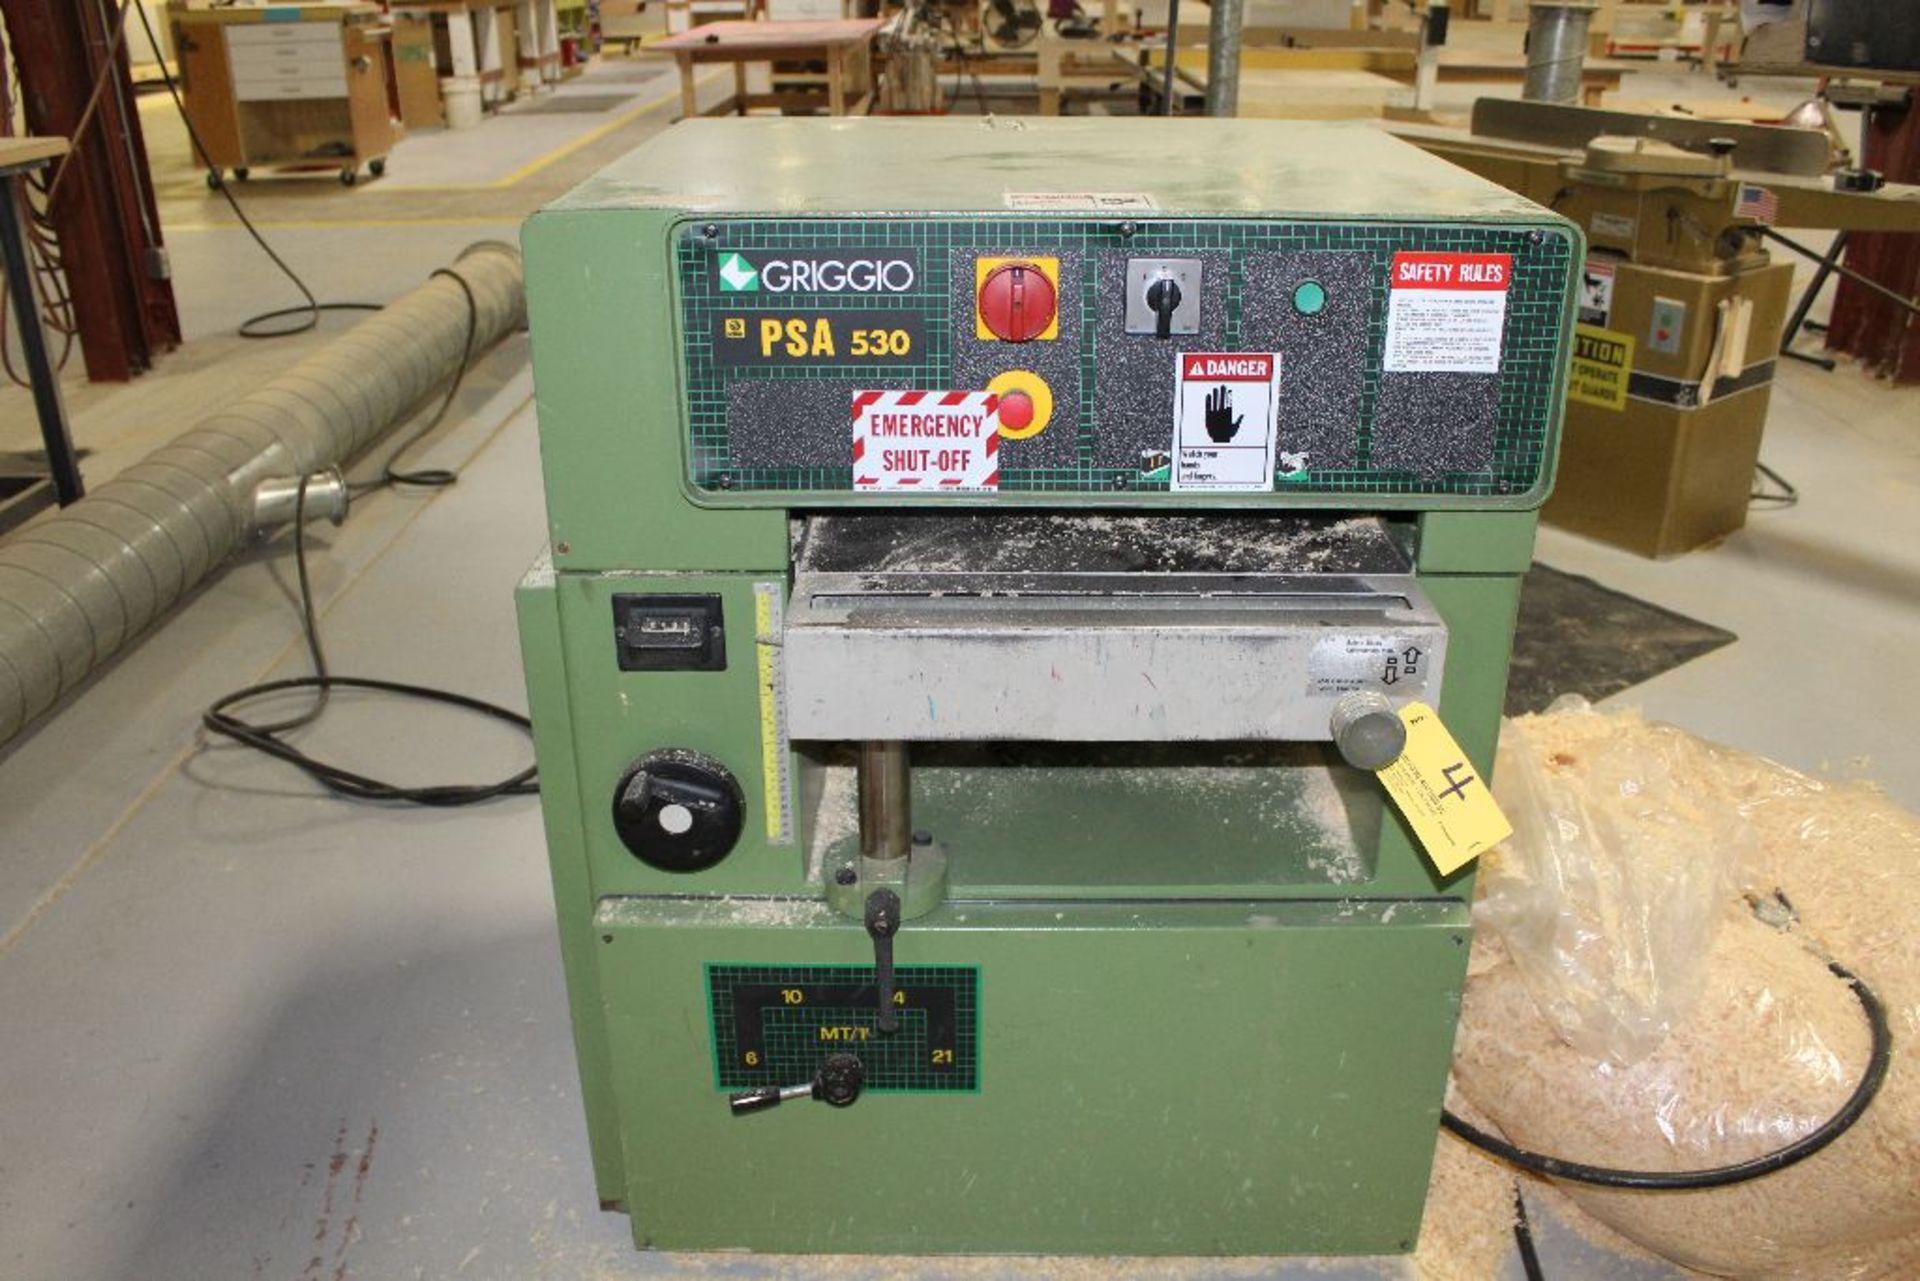 "Lot 004 - 2005 Griggio thickness planer PSA-530, sn 94003894, W-21"", volts 230/460."